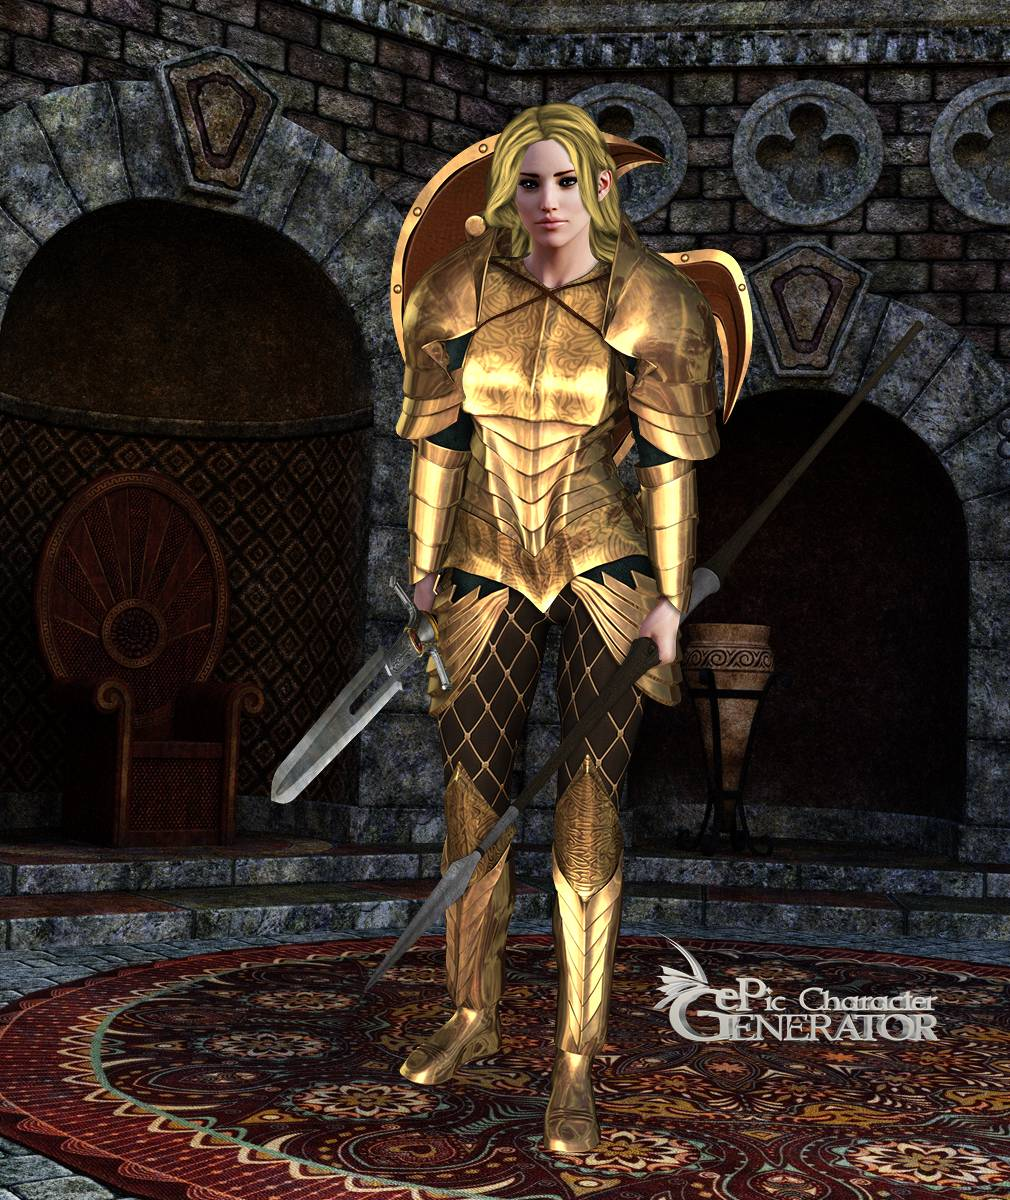 ePic Character Generator Season 2 Female Warrior Screenshot 01